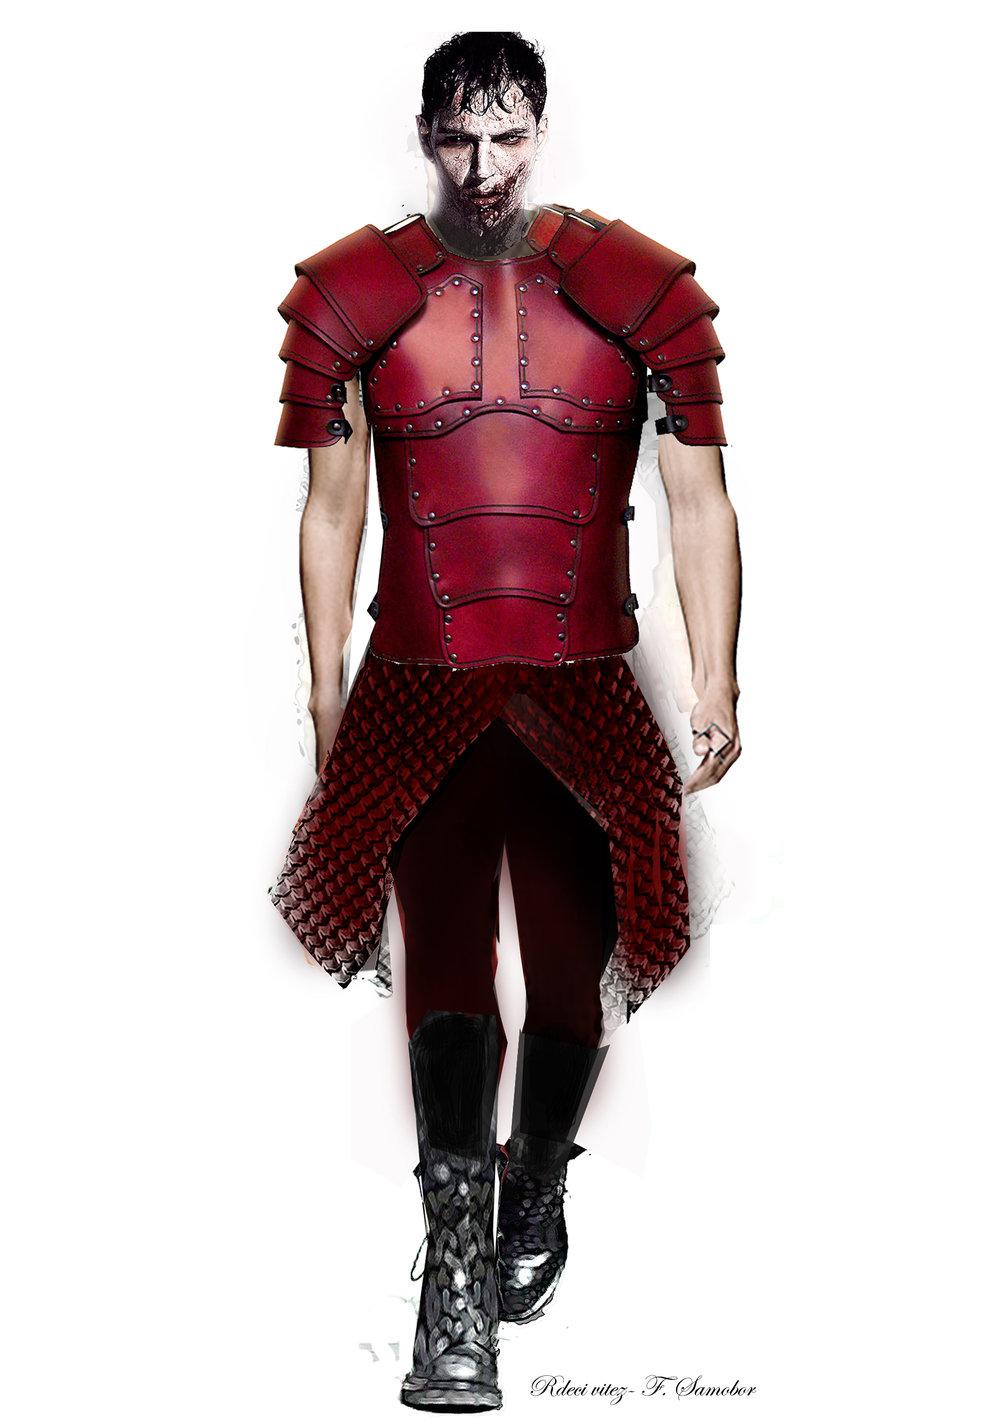 rdeči vitez1.jpg